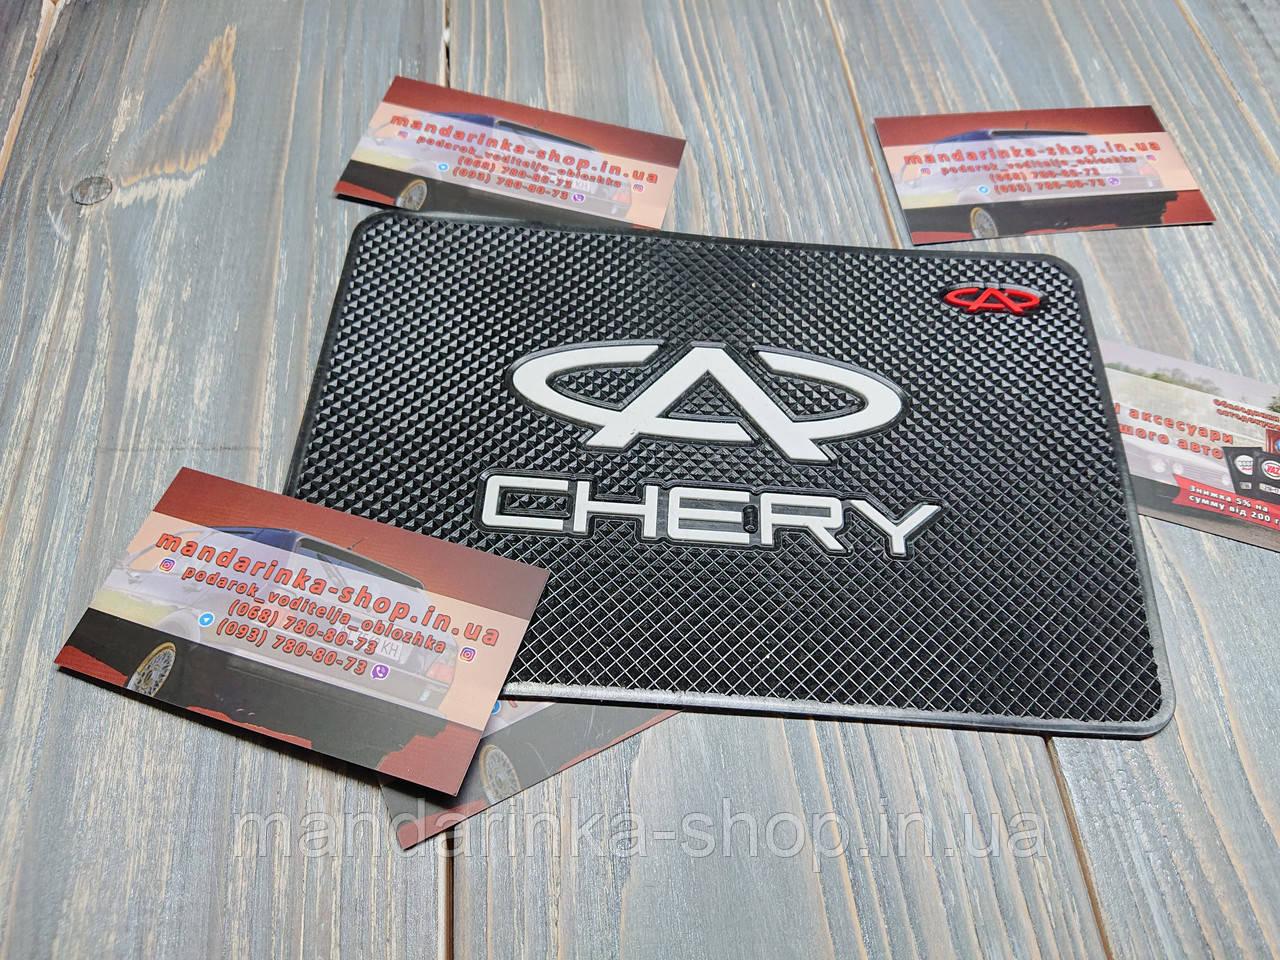 Антискользящий коврик на панель авто Chery (Чери)